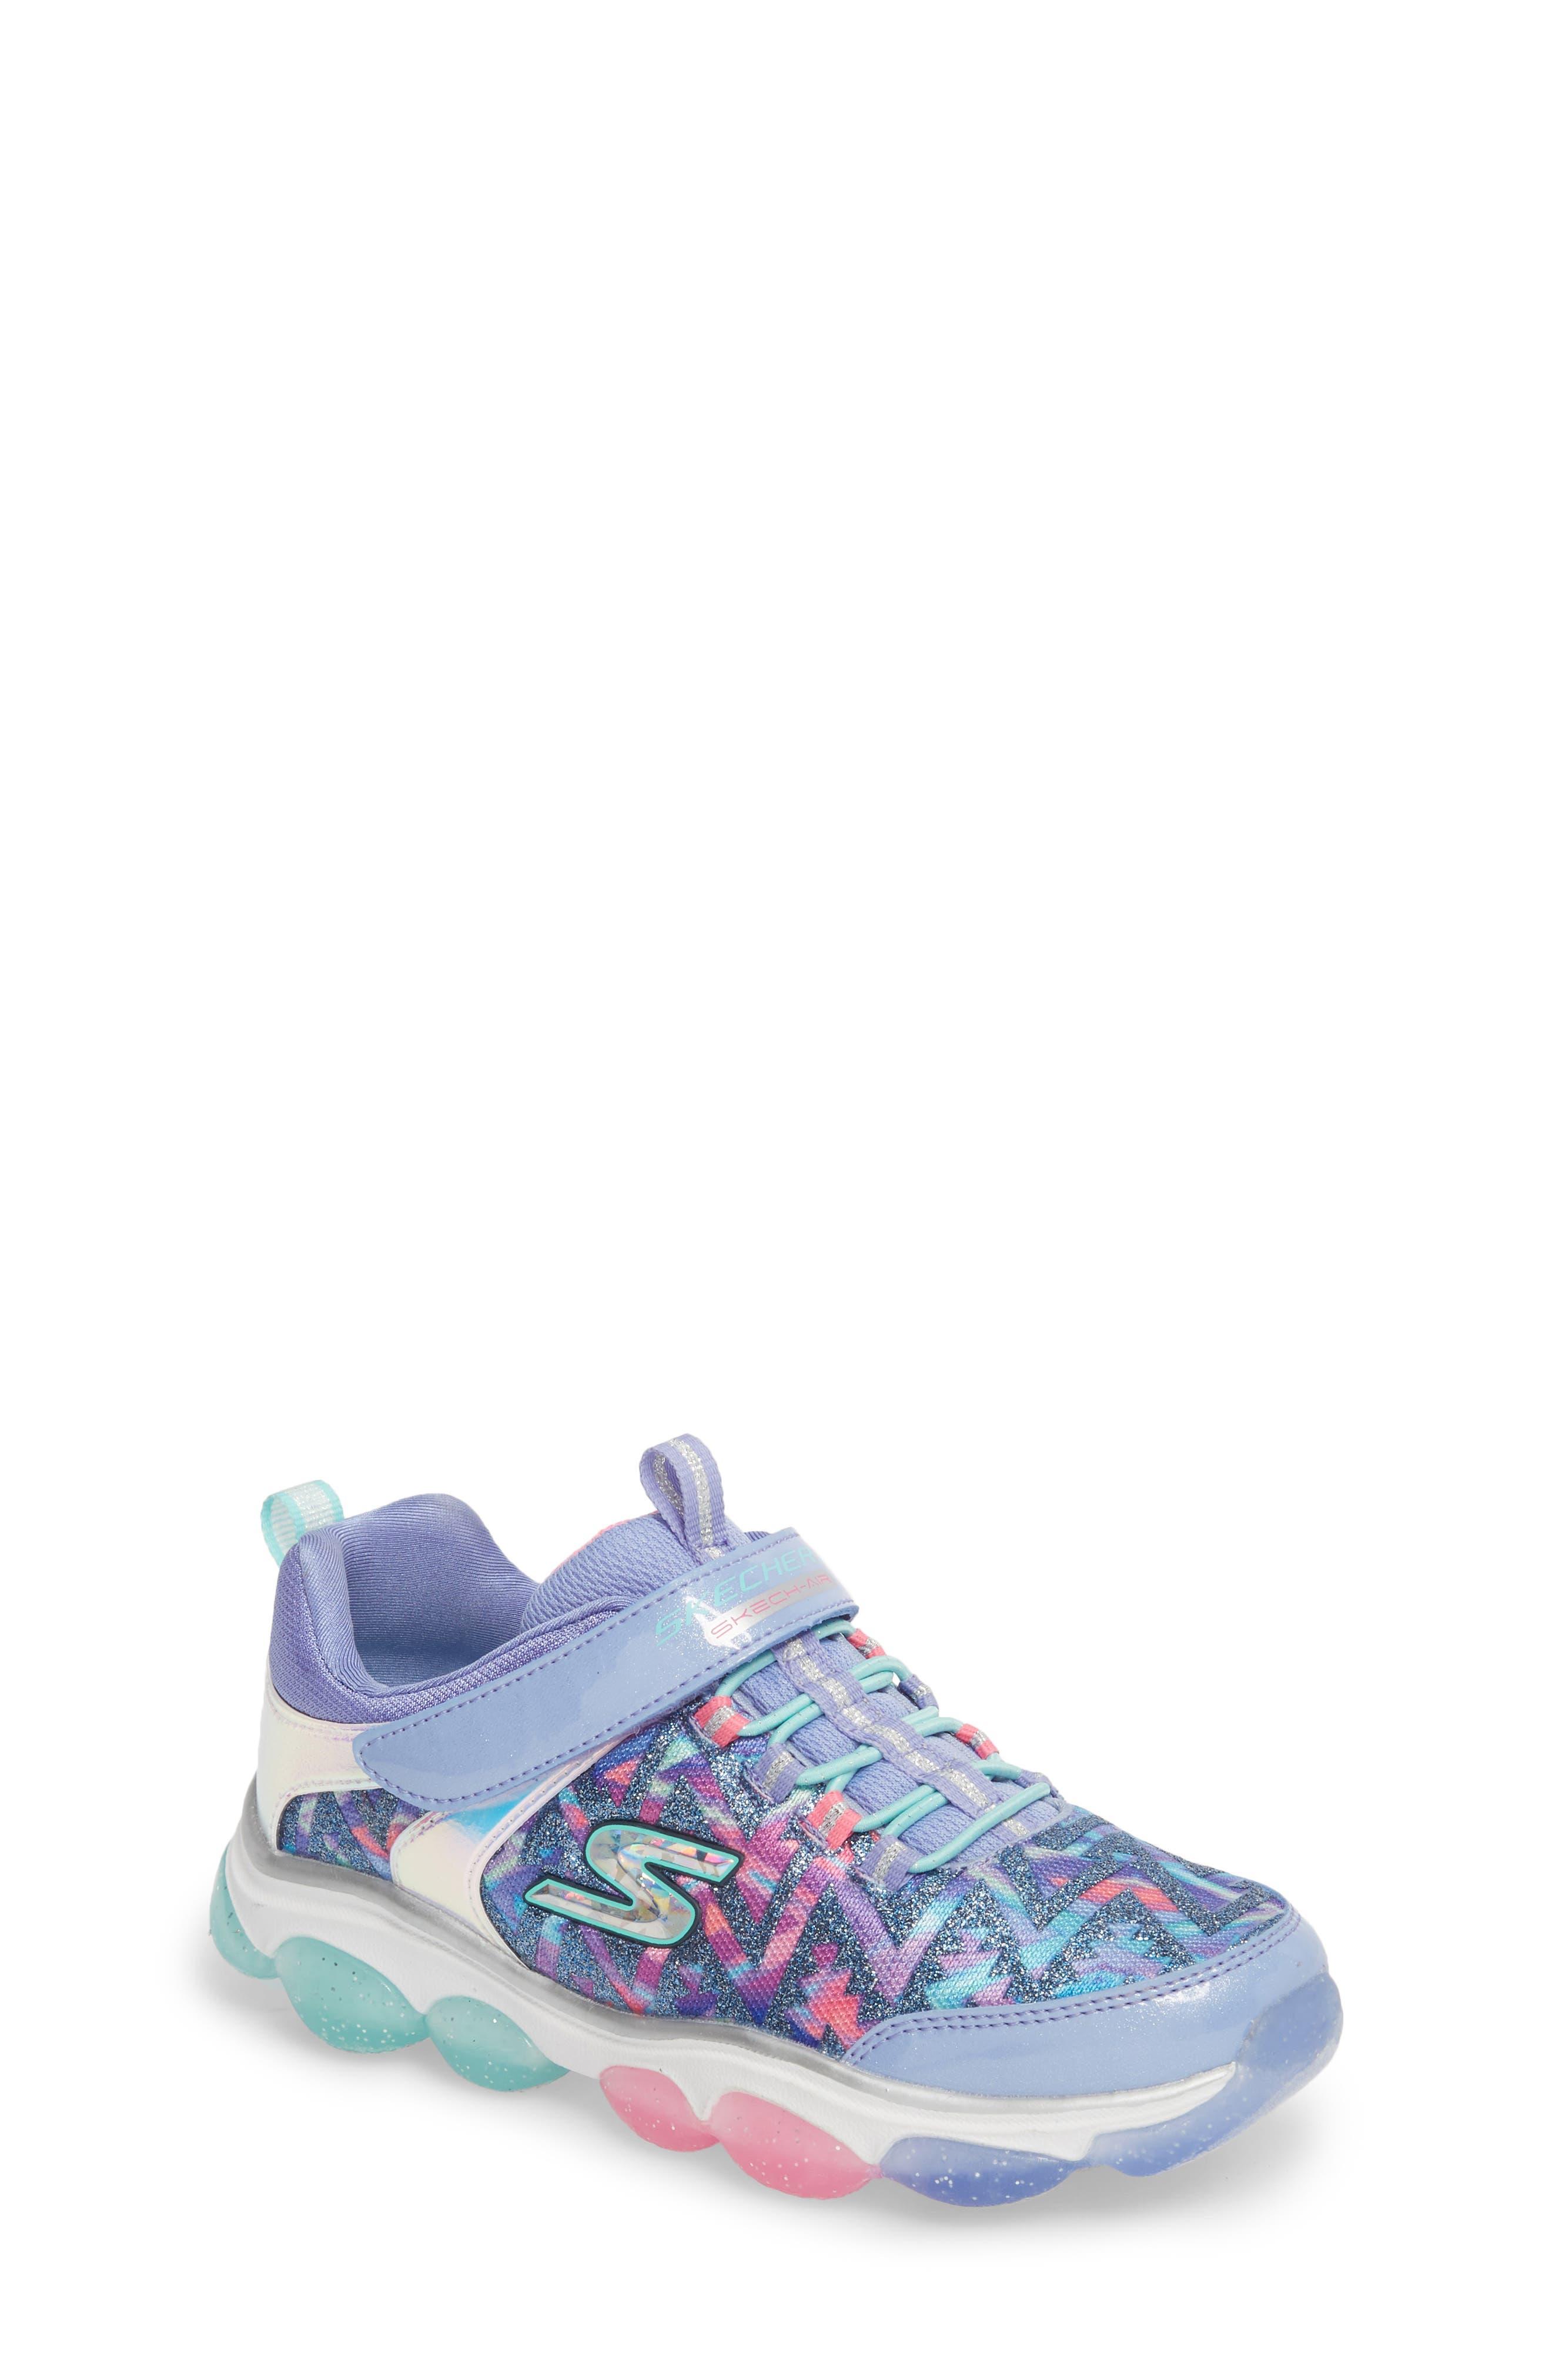 Skech-Air Groove Glitter N Go Sneakers,                         Main,                         color, 500